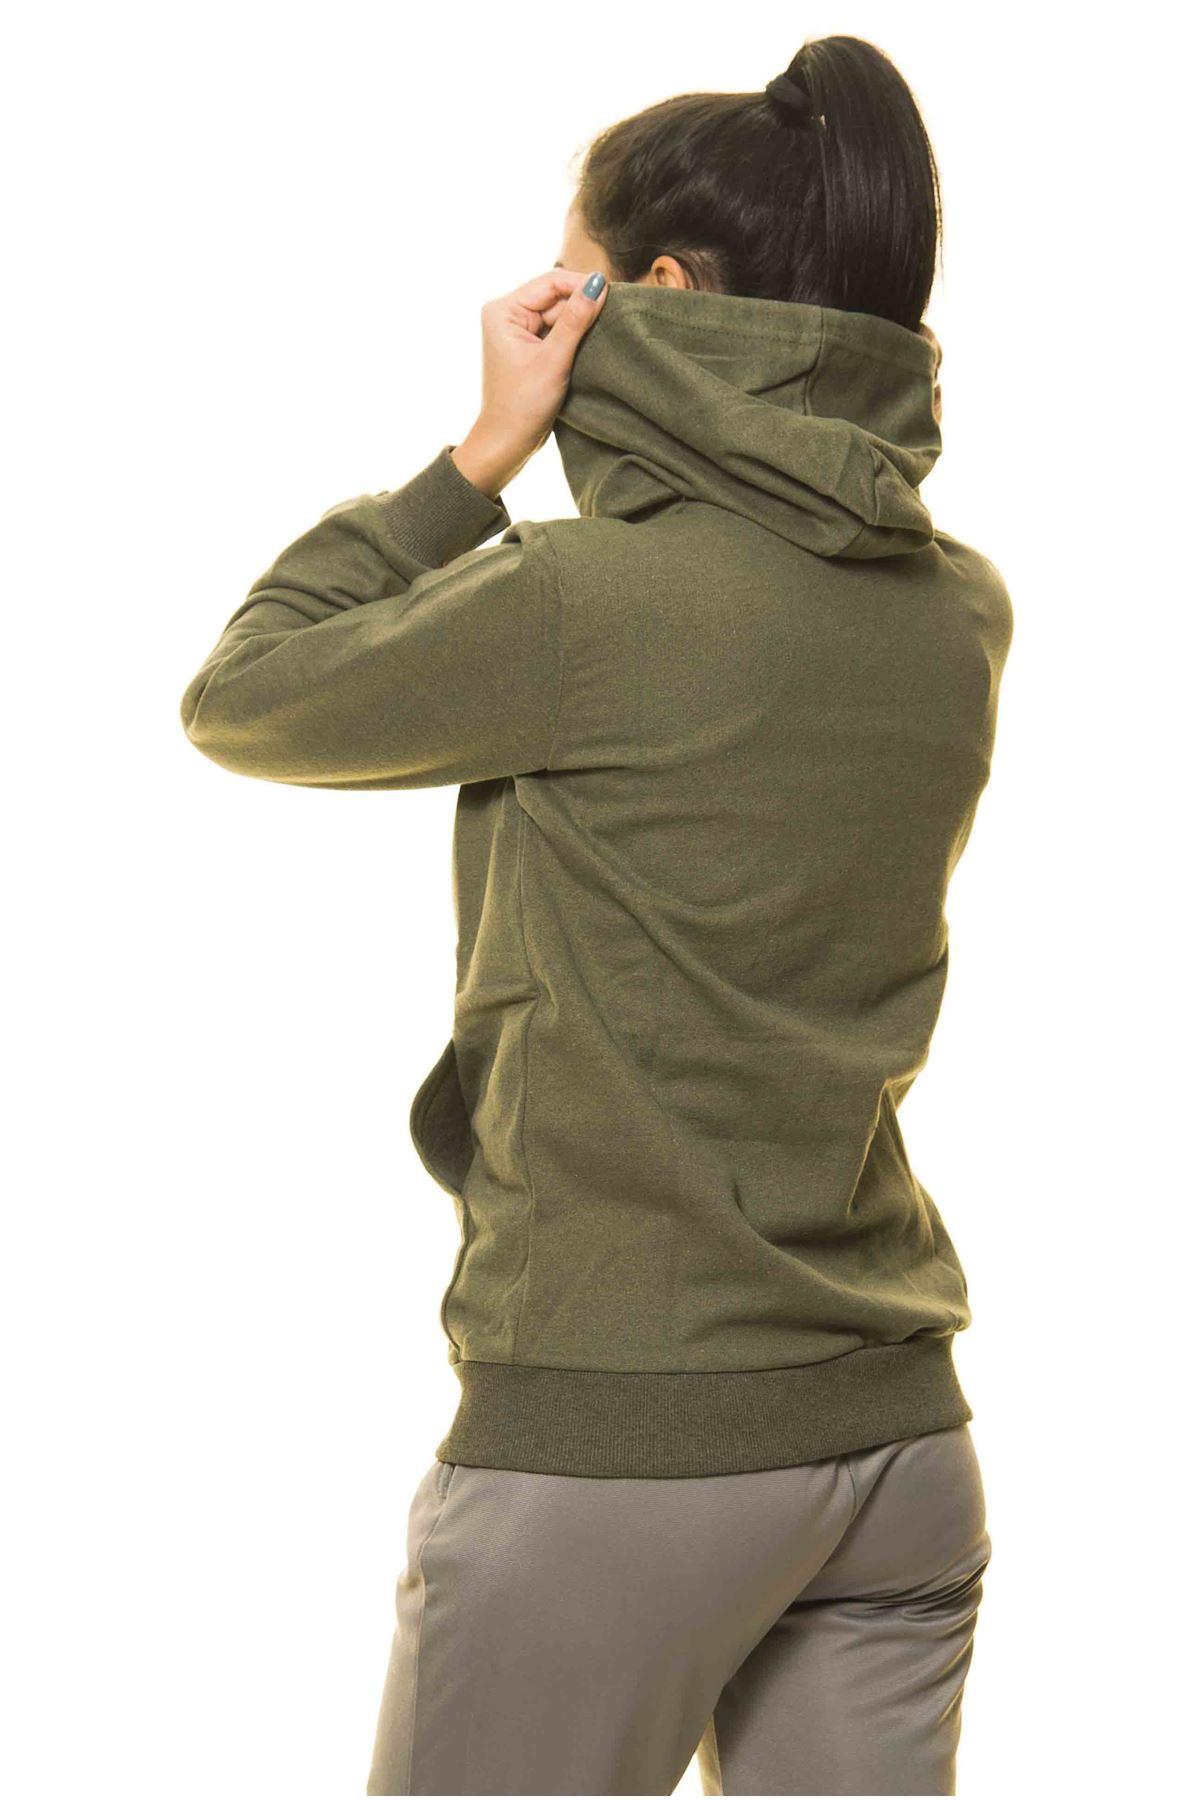 Haki Yeşil Kanguru Cep Kapüşonlu Boyfriend Örme Sweatshirt 4D-2089